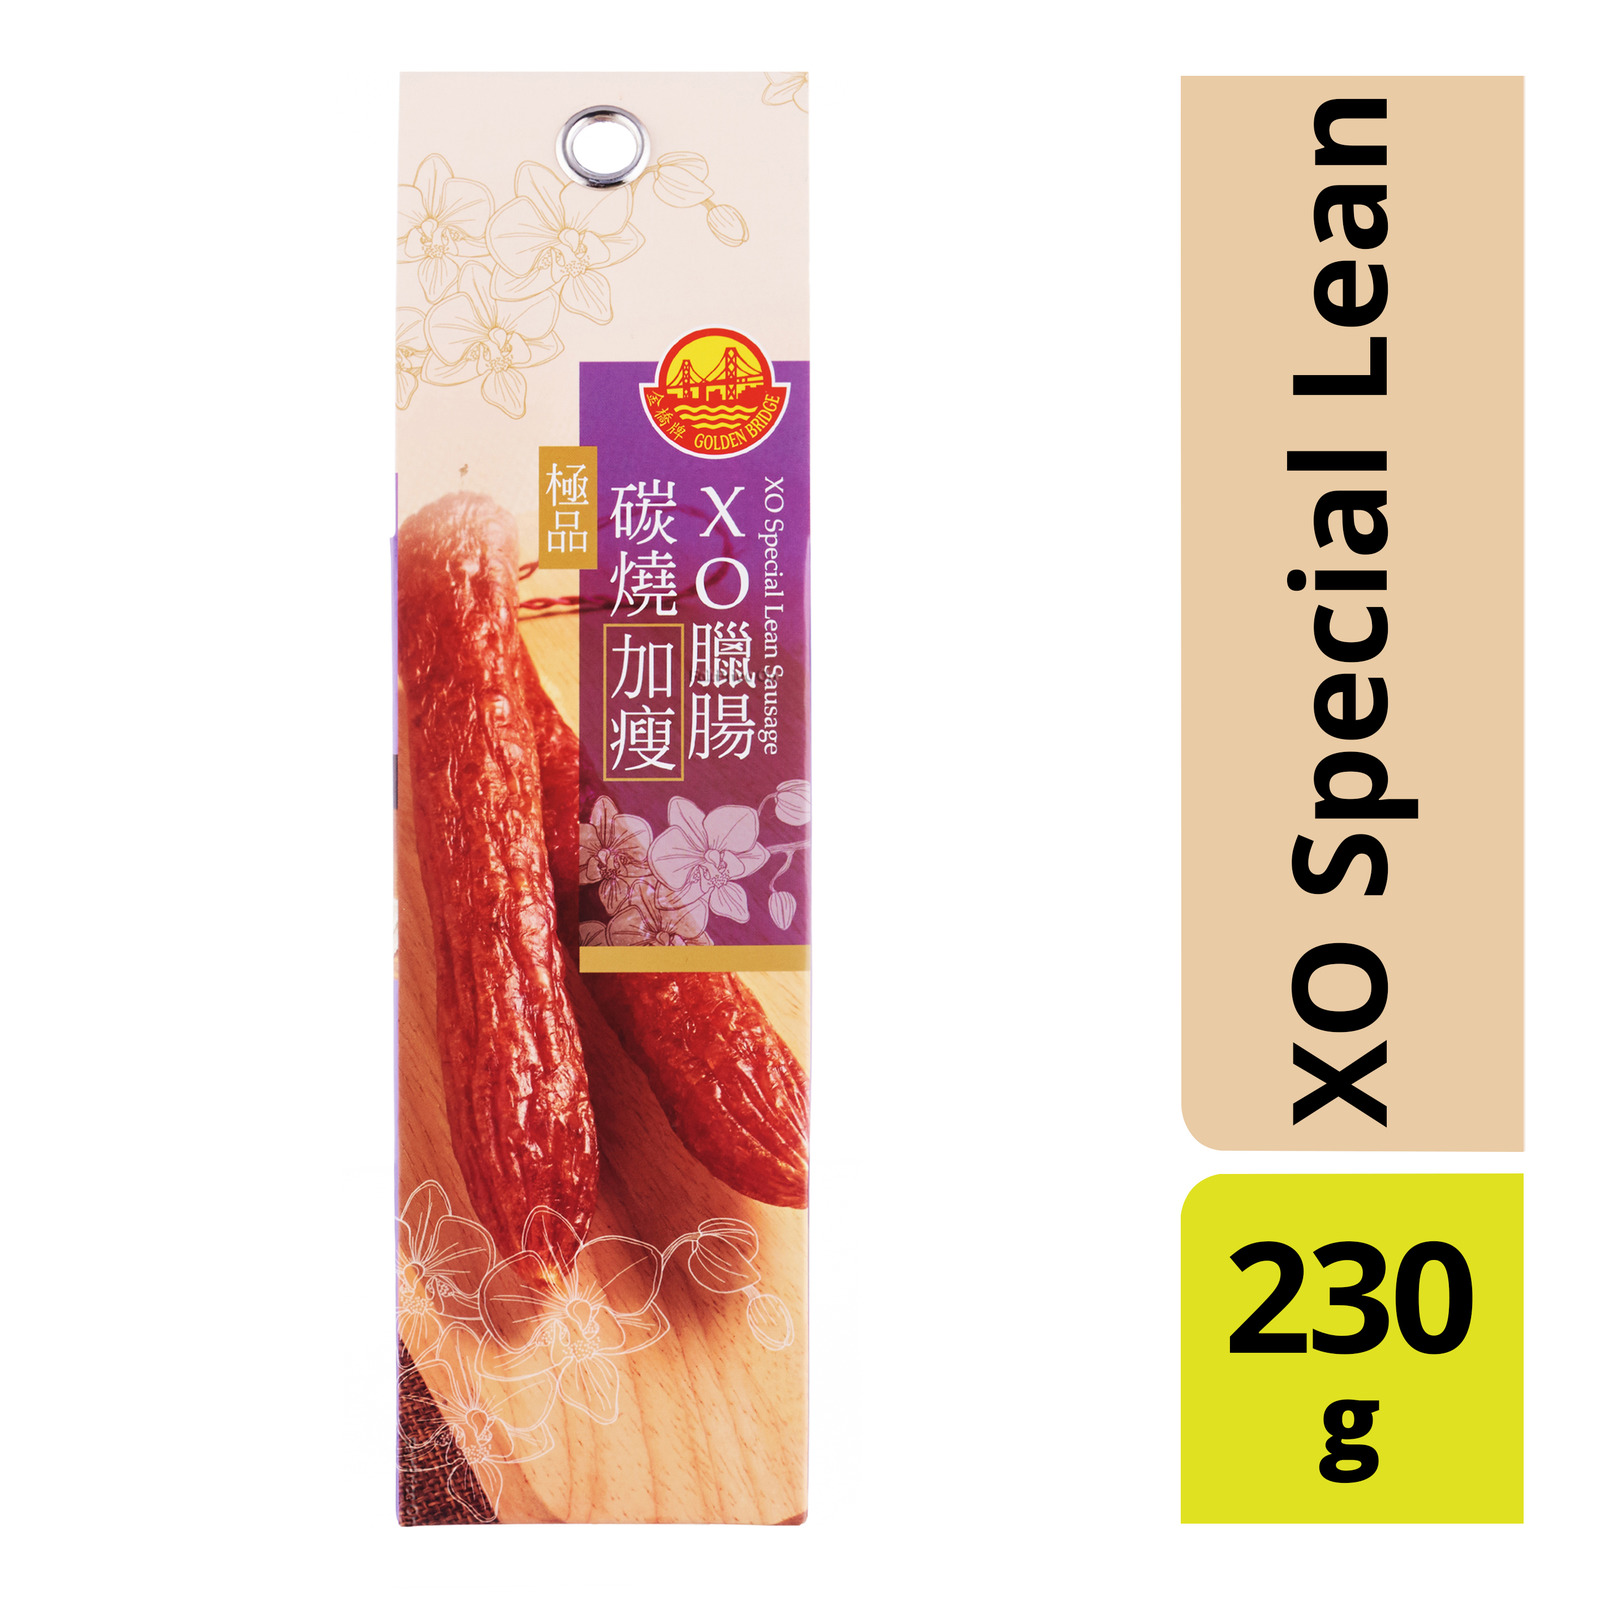 Golden Bridge Sausage - XO Special Lean